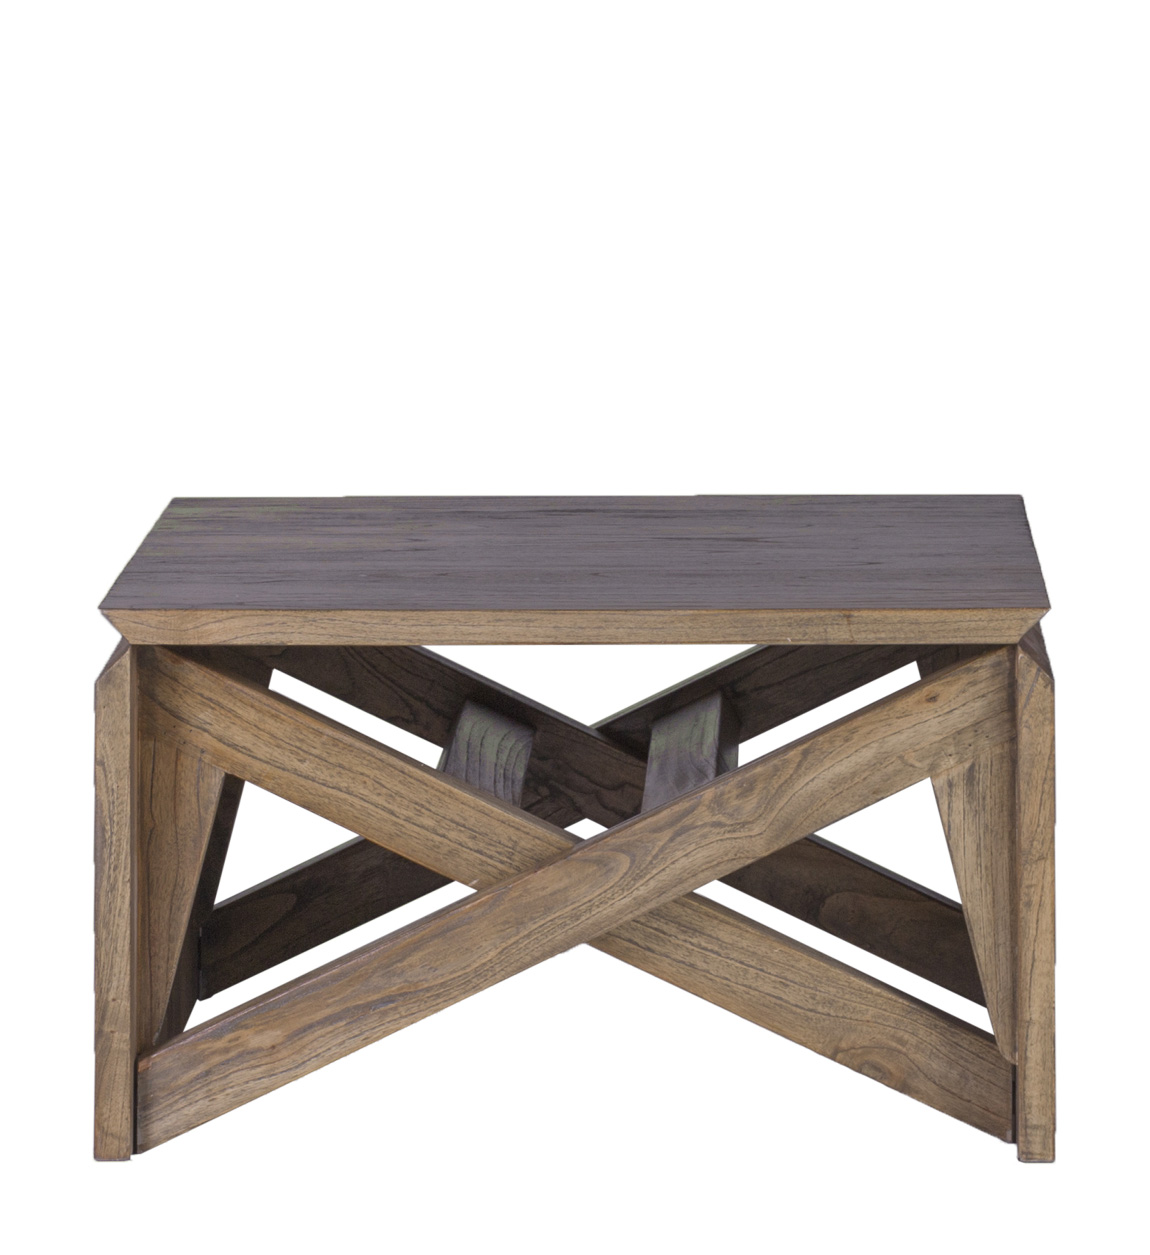 Rustic Convertible Coffee Table Moycor